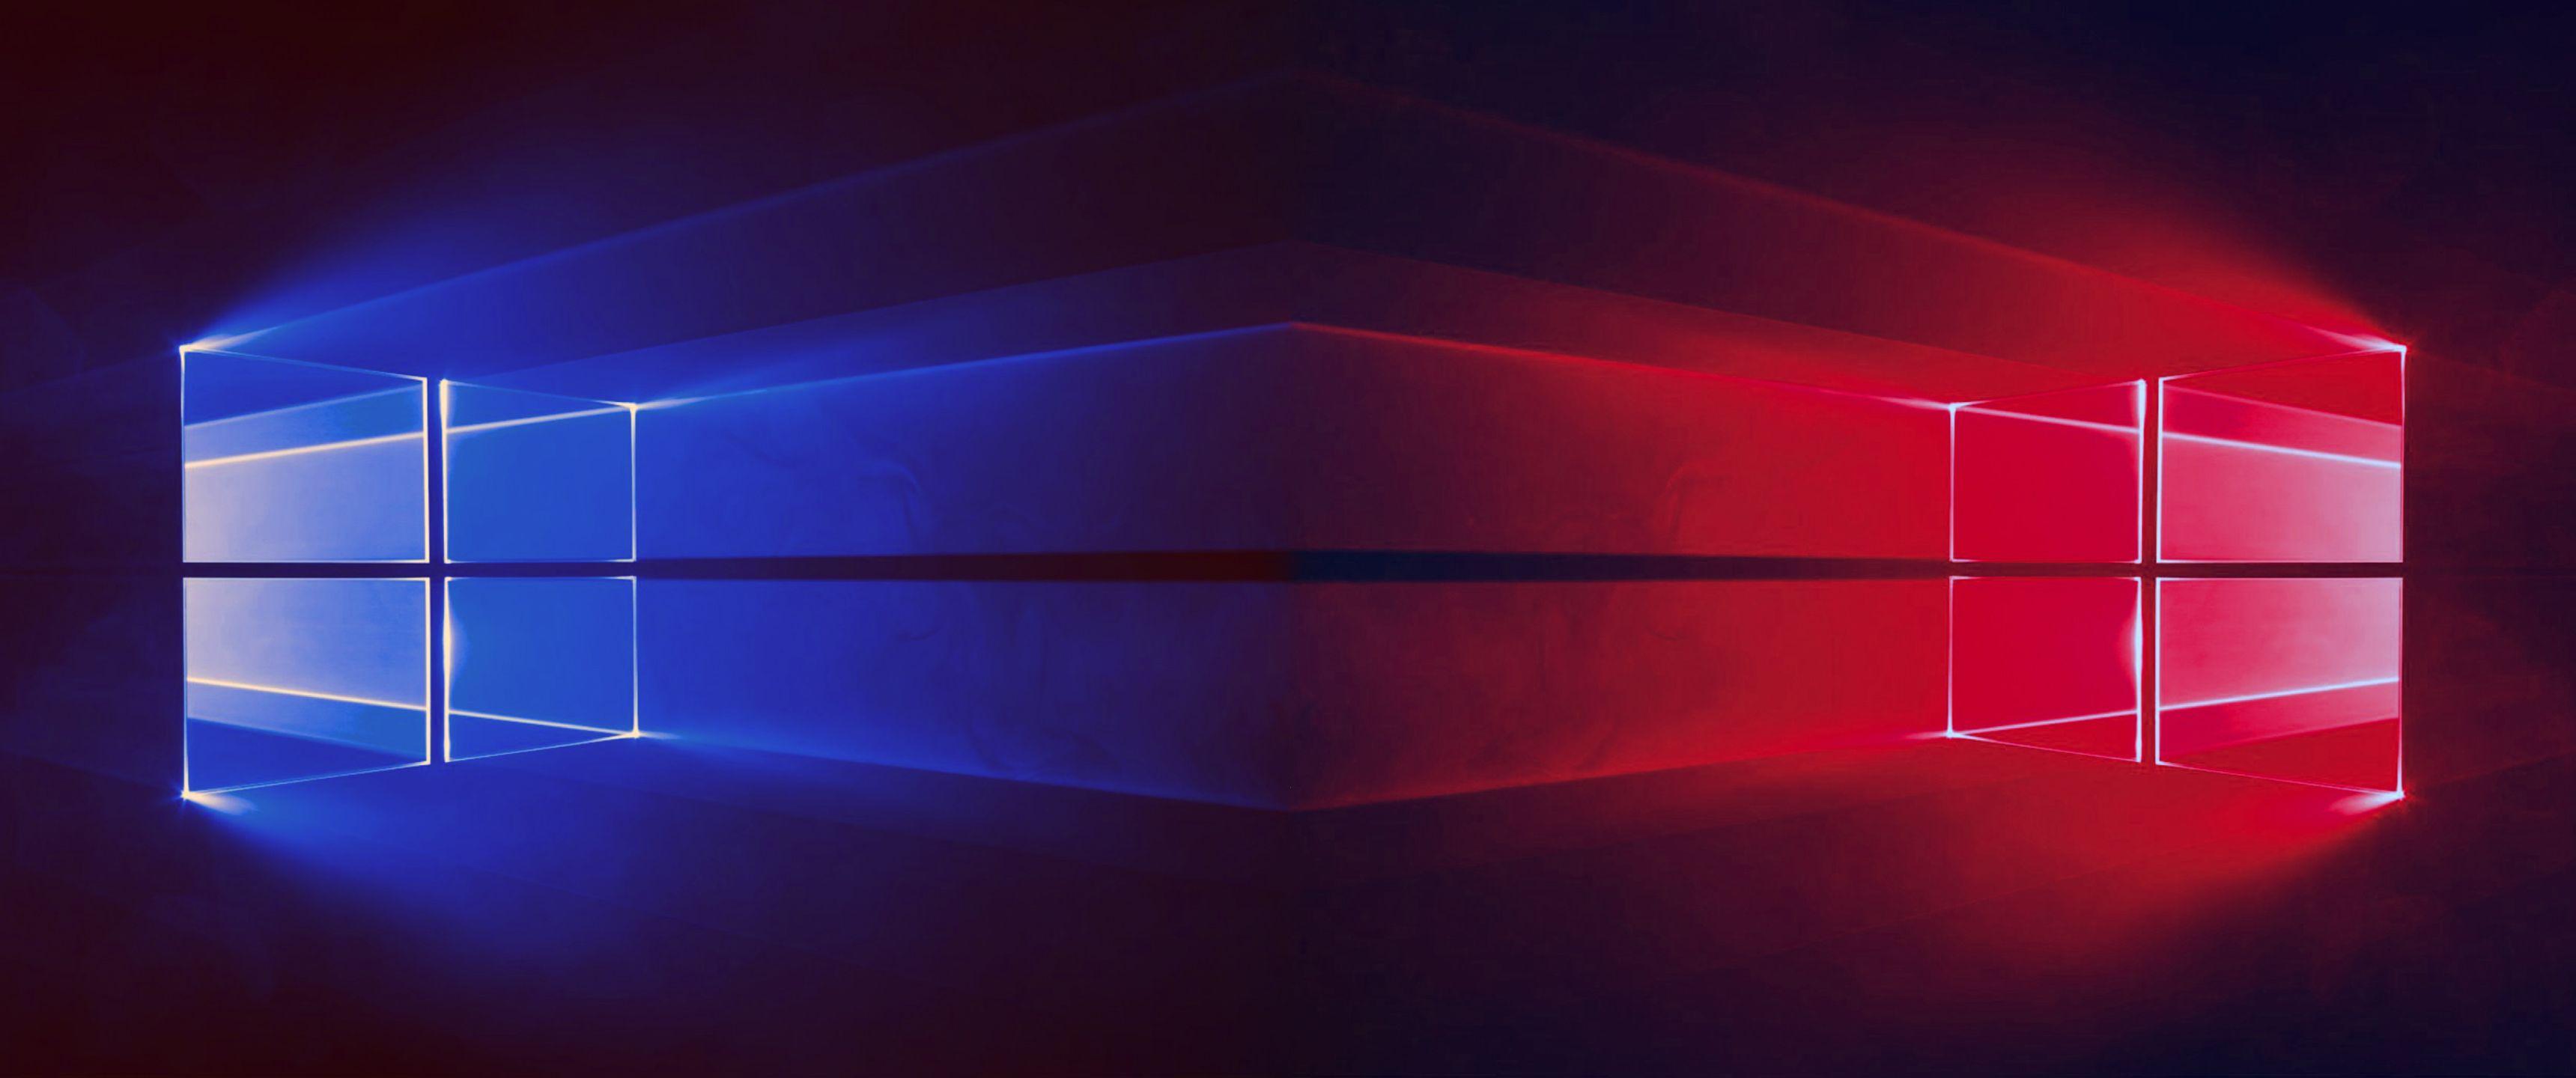 Windows 10 - 2 Windows Blue & Red - 3440x1440 | wallpaper in 2019 | Windows 10, Wallpaper ...